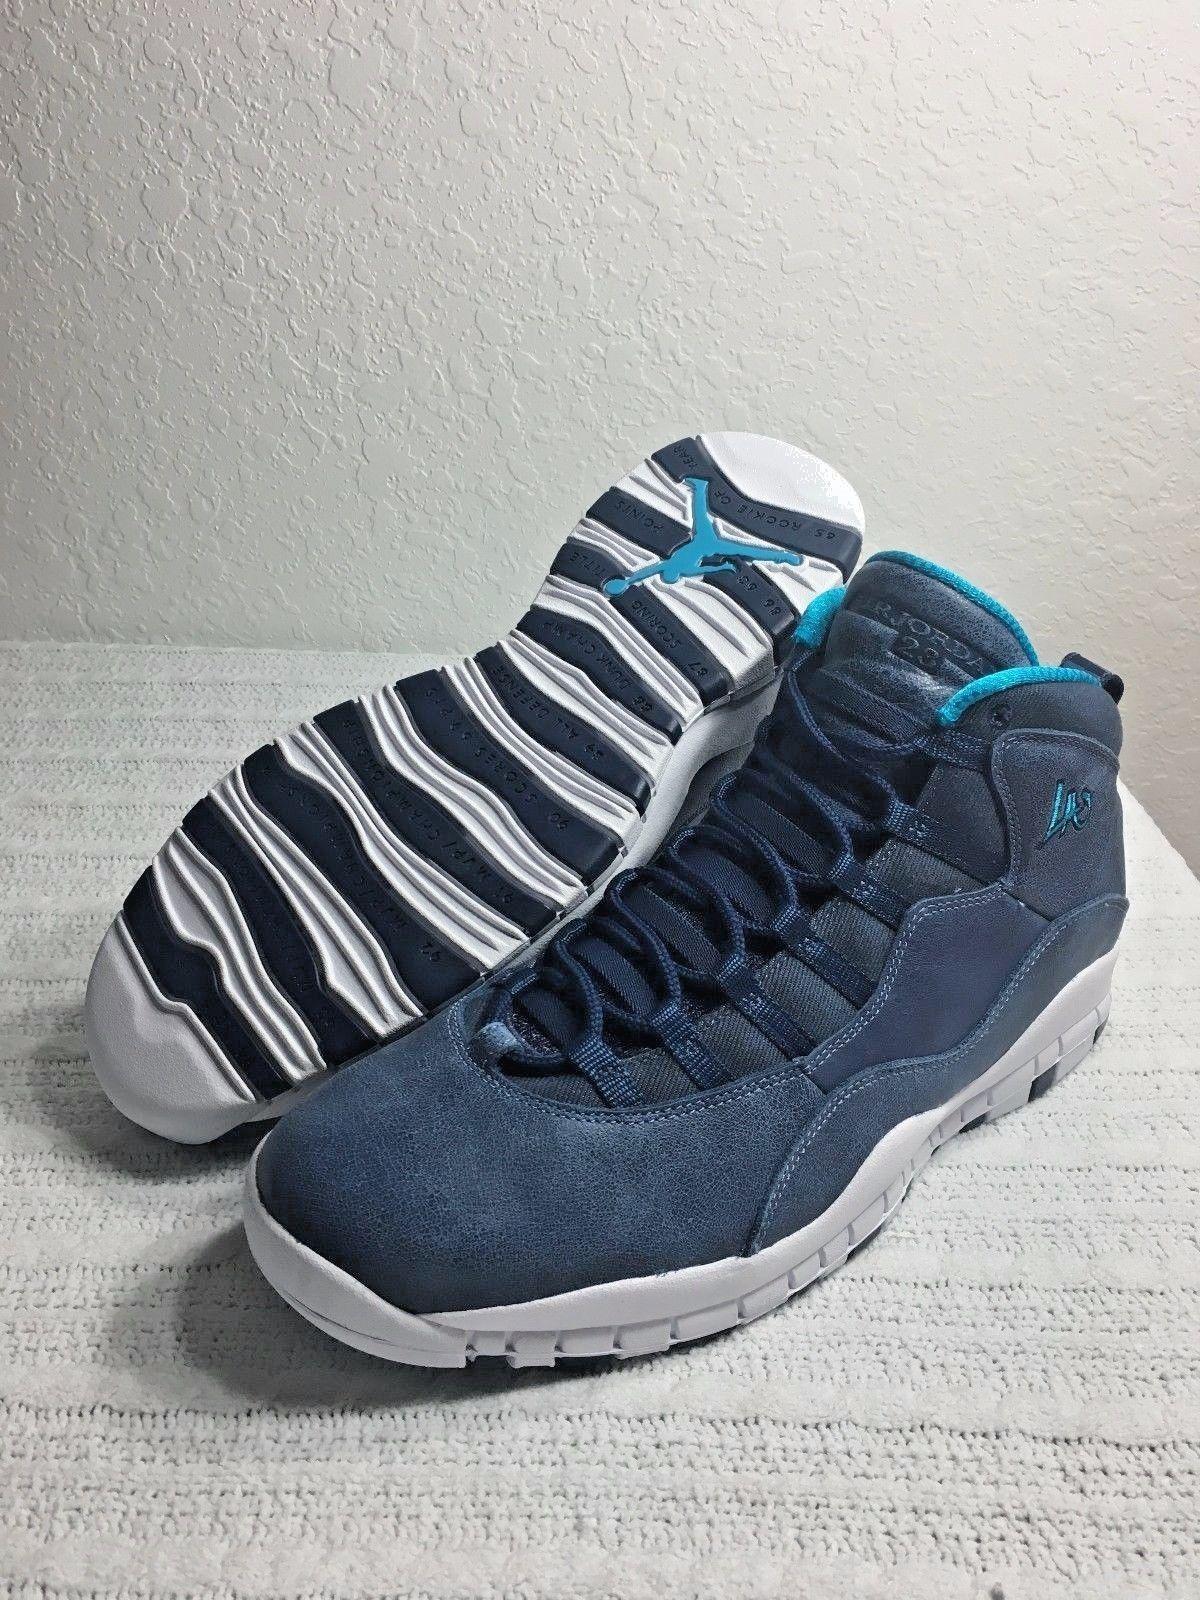 b7abd3effc84 Nike Air Jordan Retro 10 La Pack Men Size 13 and 50 similar items. S l1600